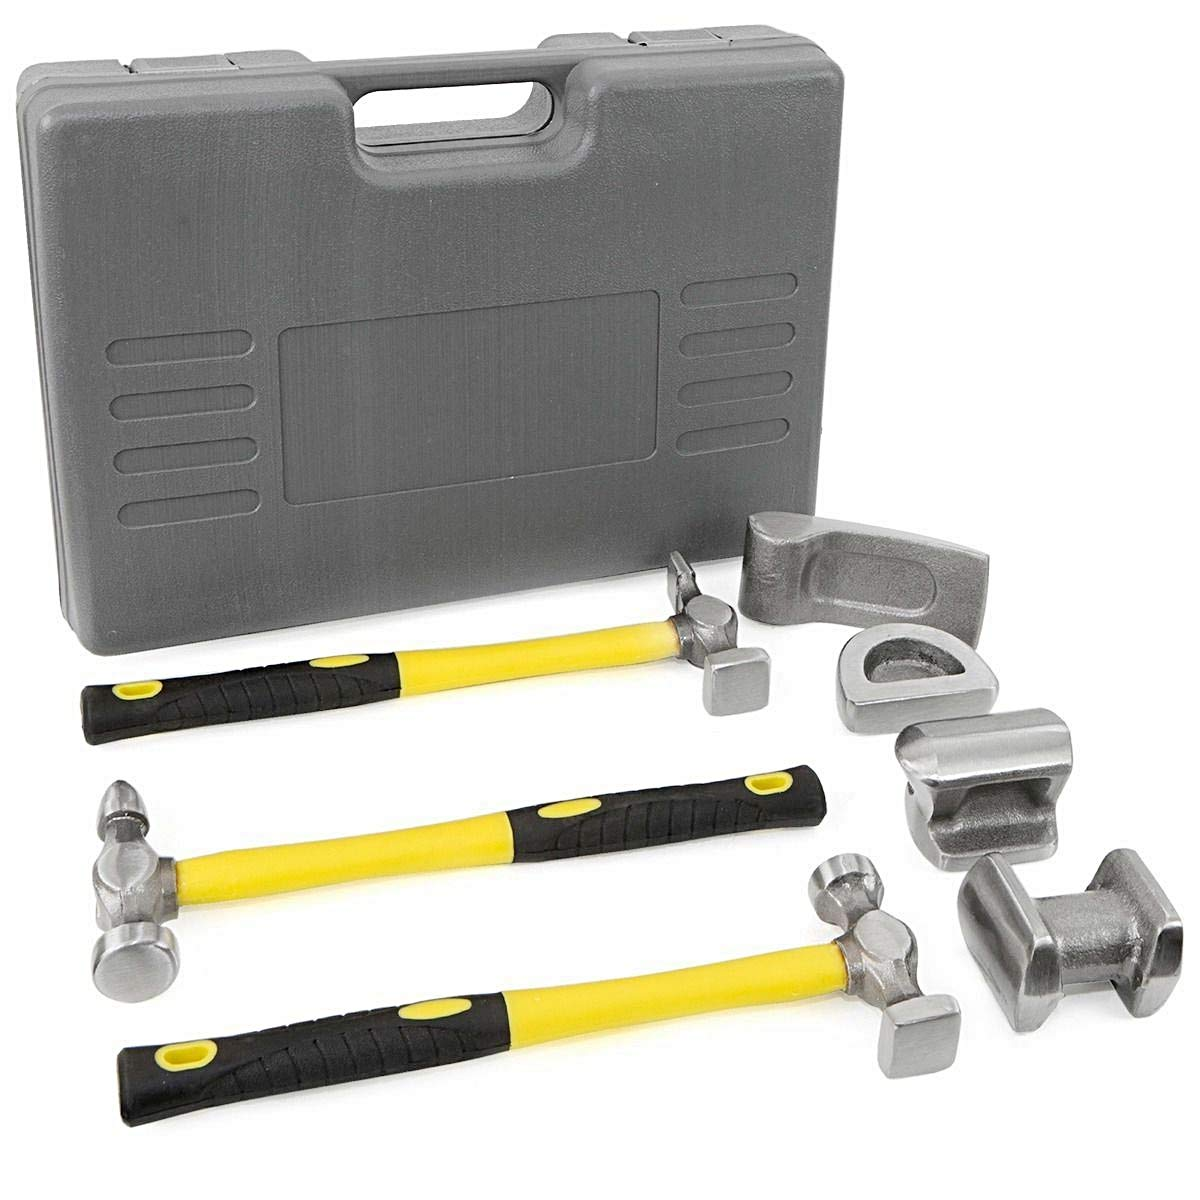 Set of 7 Pcs Standard Bumping Fiberglass Hammer Tool Fender Kits Hammer Dolly Dent Bender Improvement Home Repair Heavy Duty Box Hardware Hand-tool